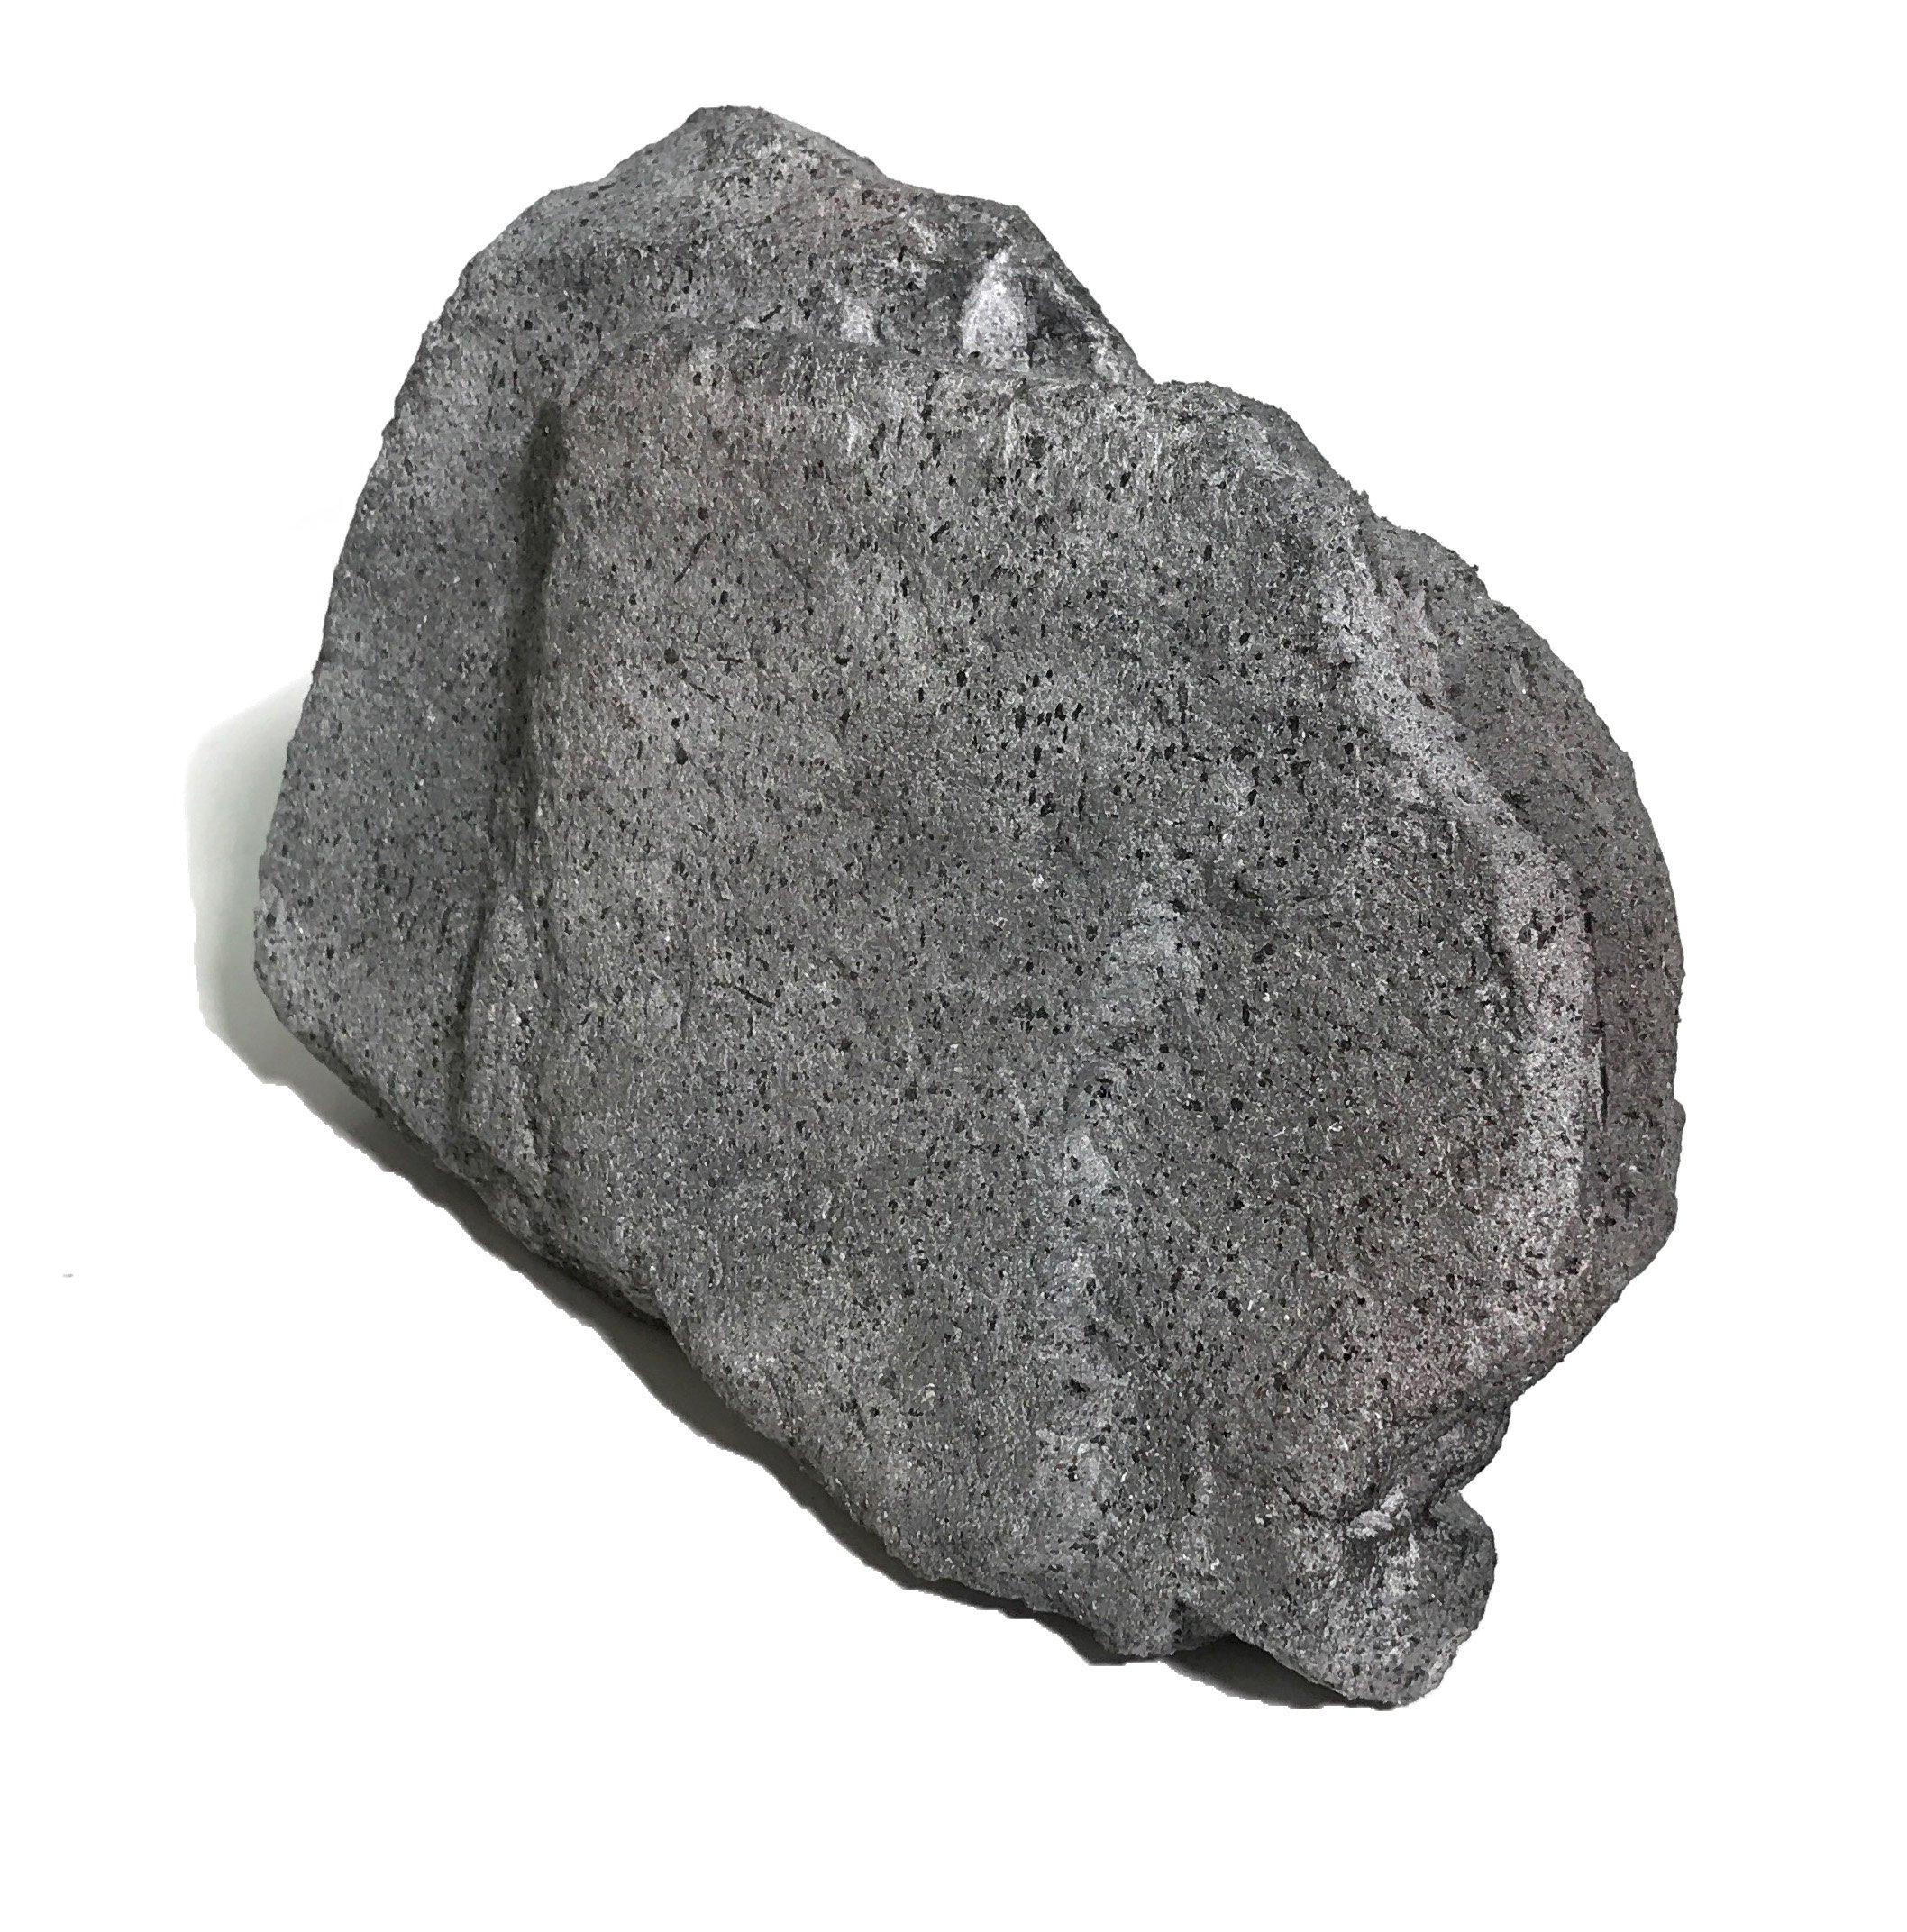 Foam Rubber Stunt Large Granite Fake Rock Prop by NewRuleFX (Image #2)